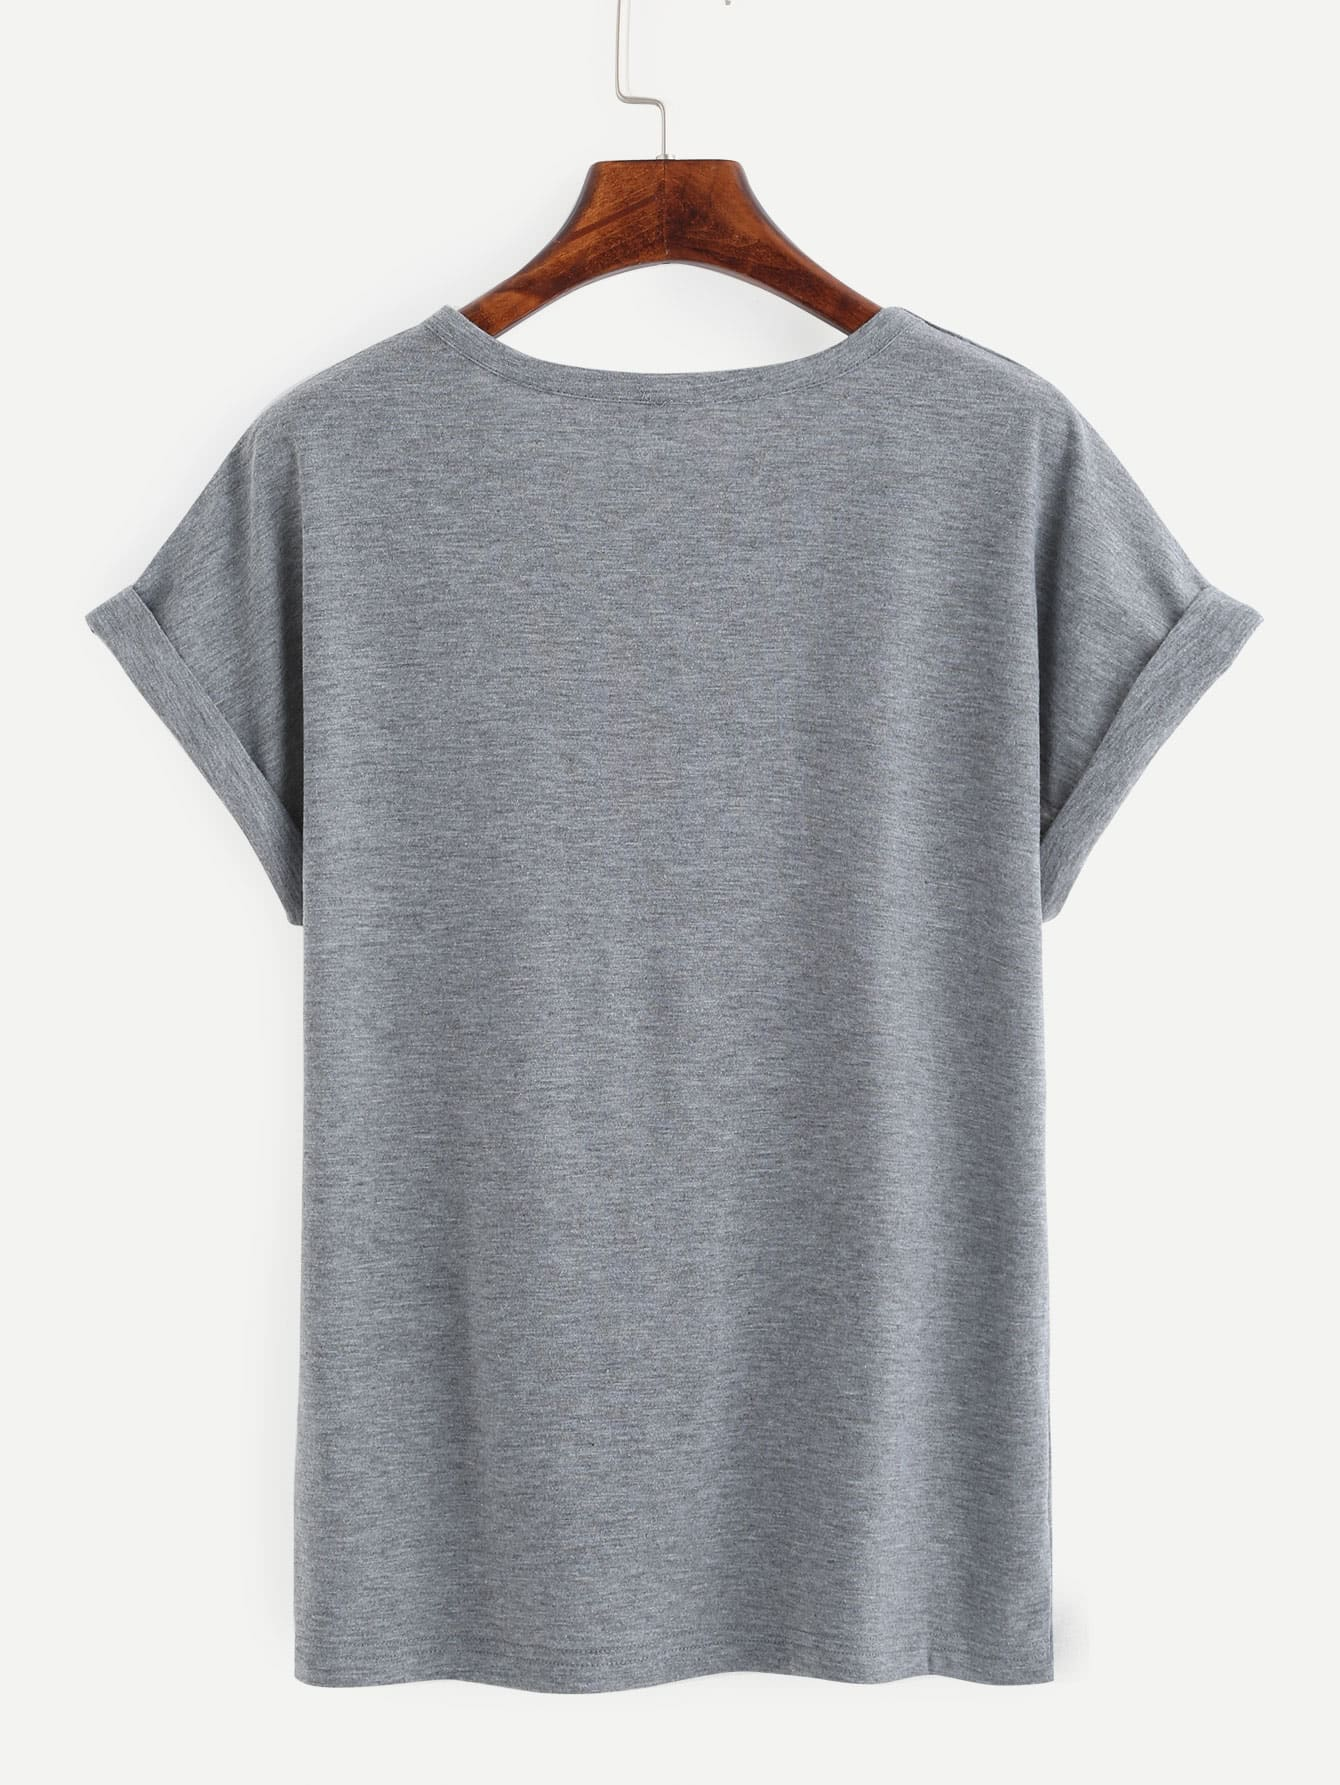 Heather Grey Alien Print Roll Sleeve T-shirt